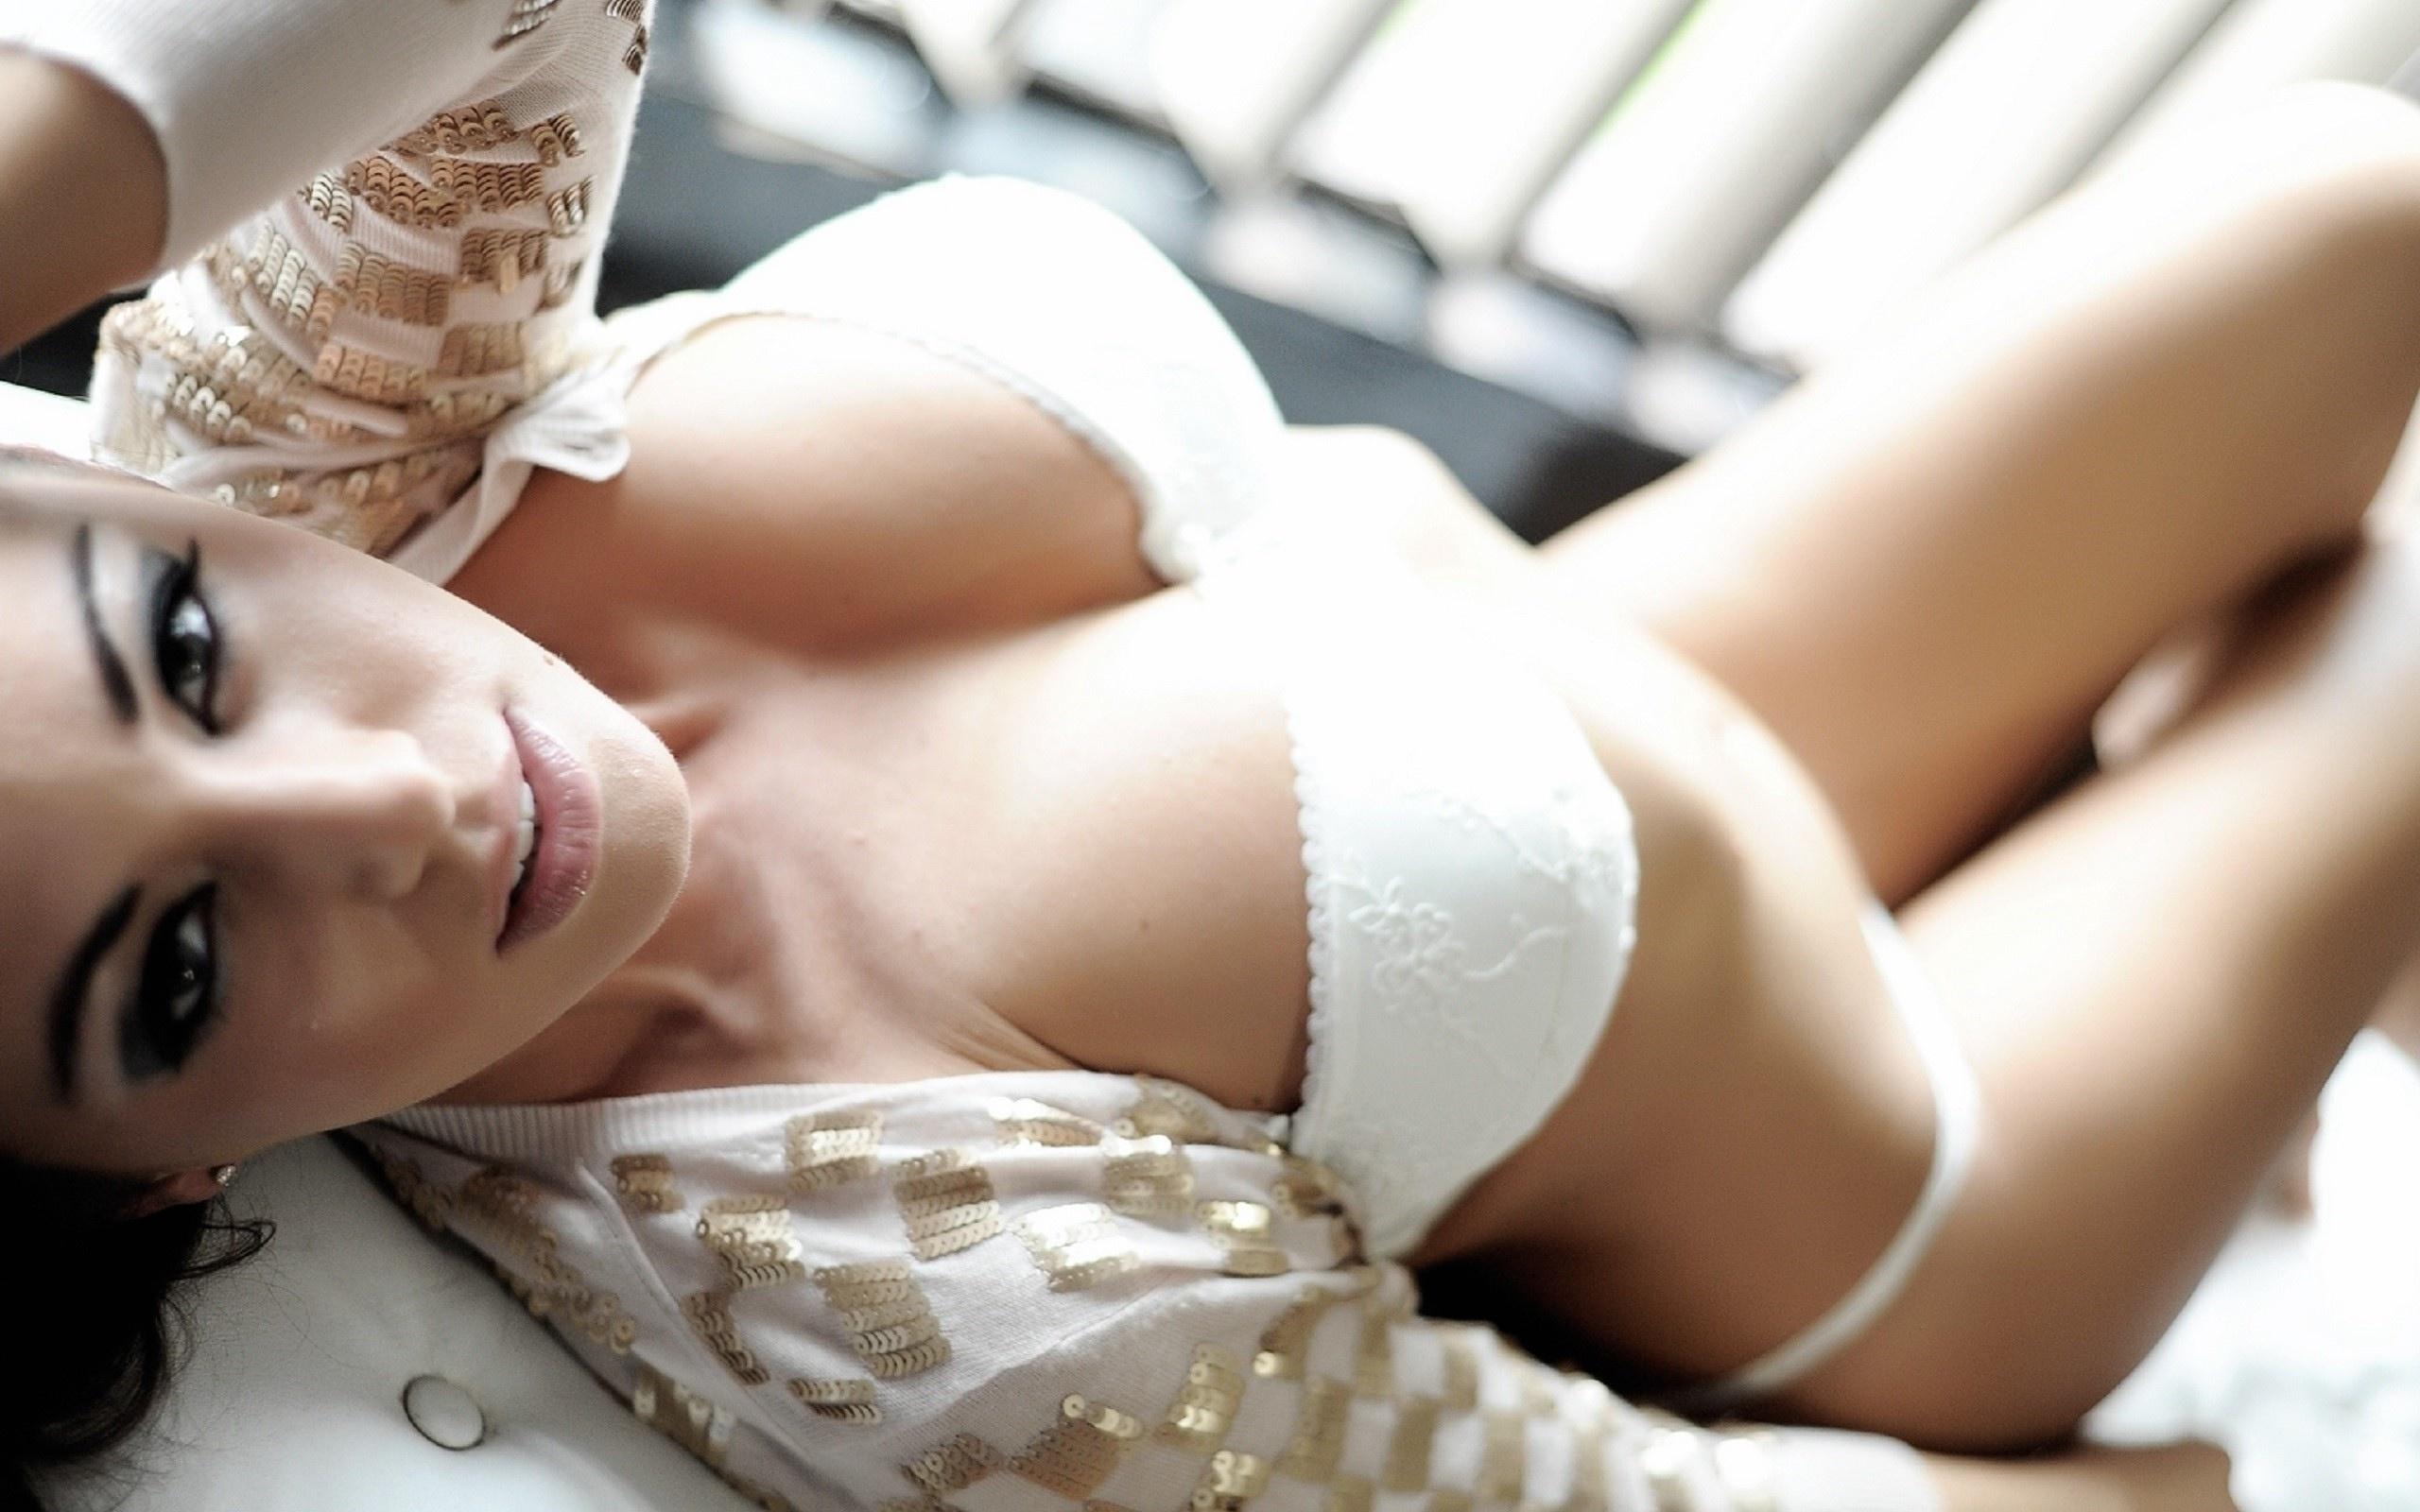 женщина видео груди - 7